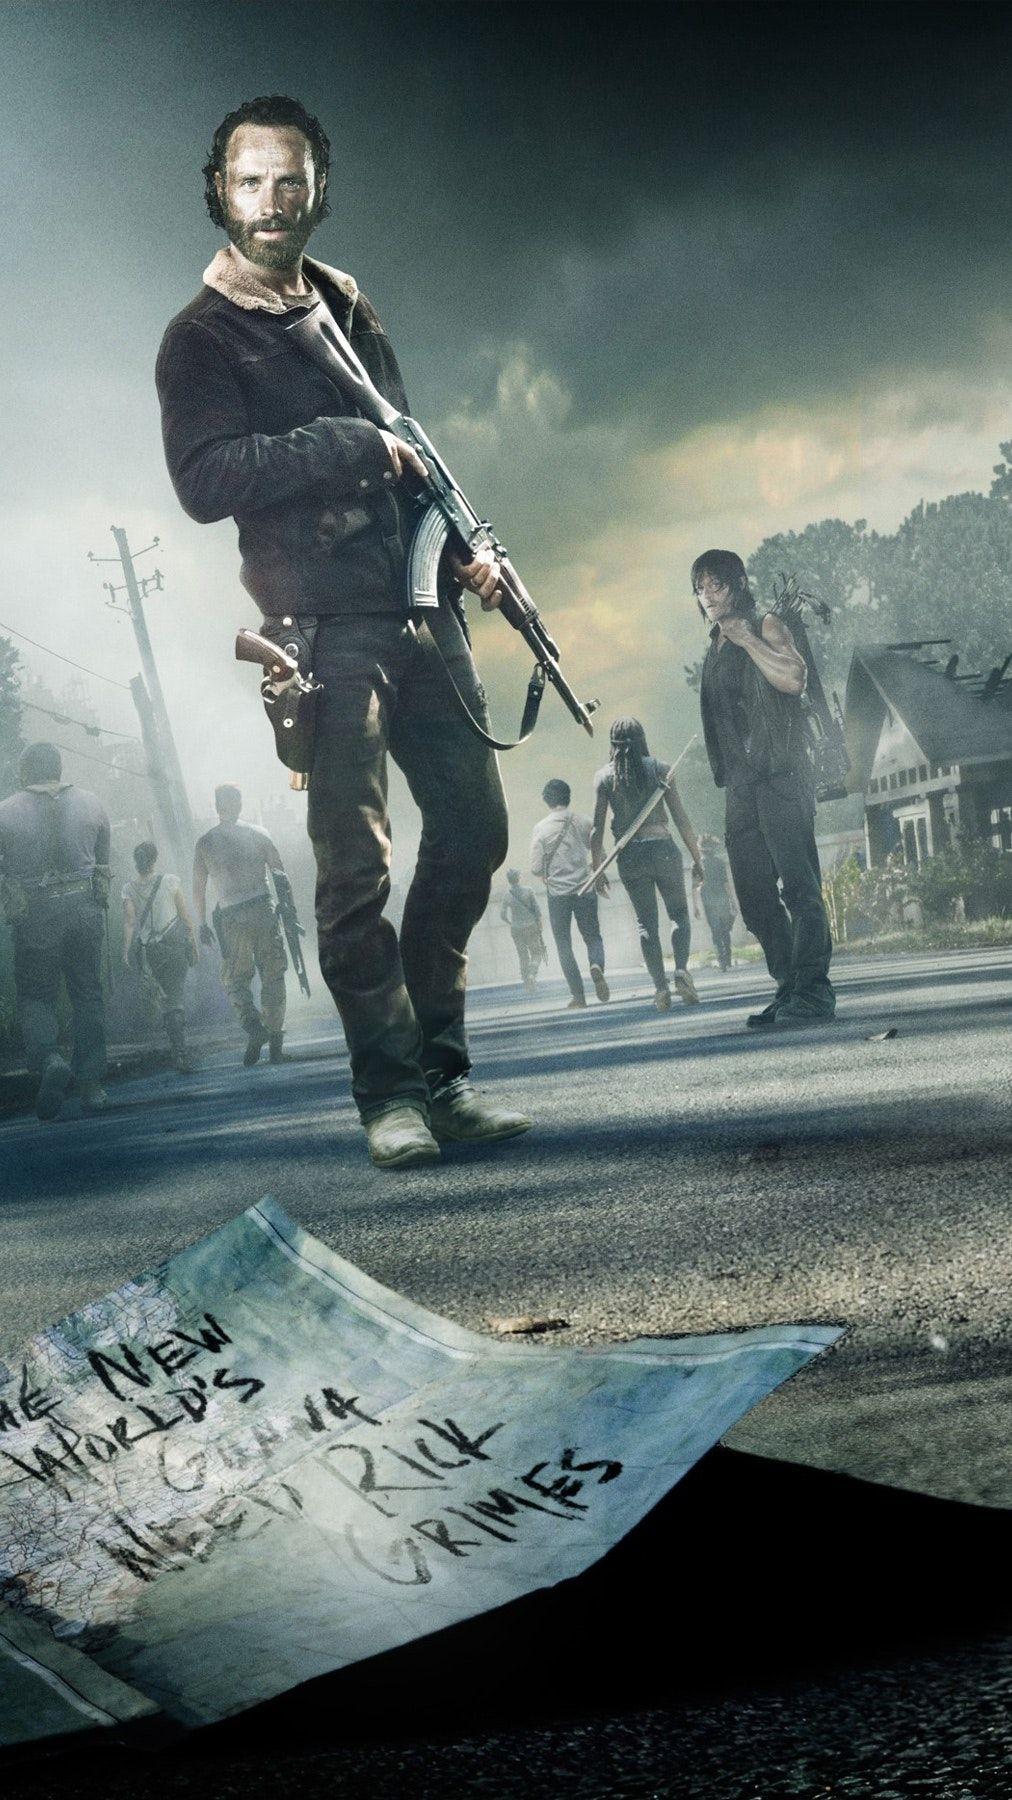 The Walking Dead Phone Wallpaper Moviemania Walking Dead Wallpaper Fear The Walking Dead Walking Dead Art